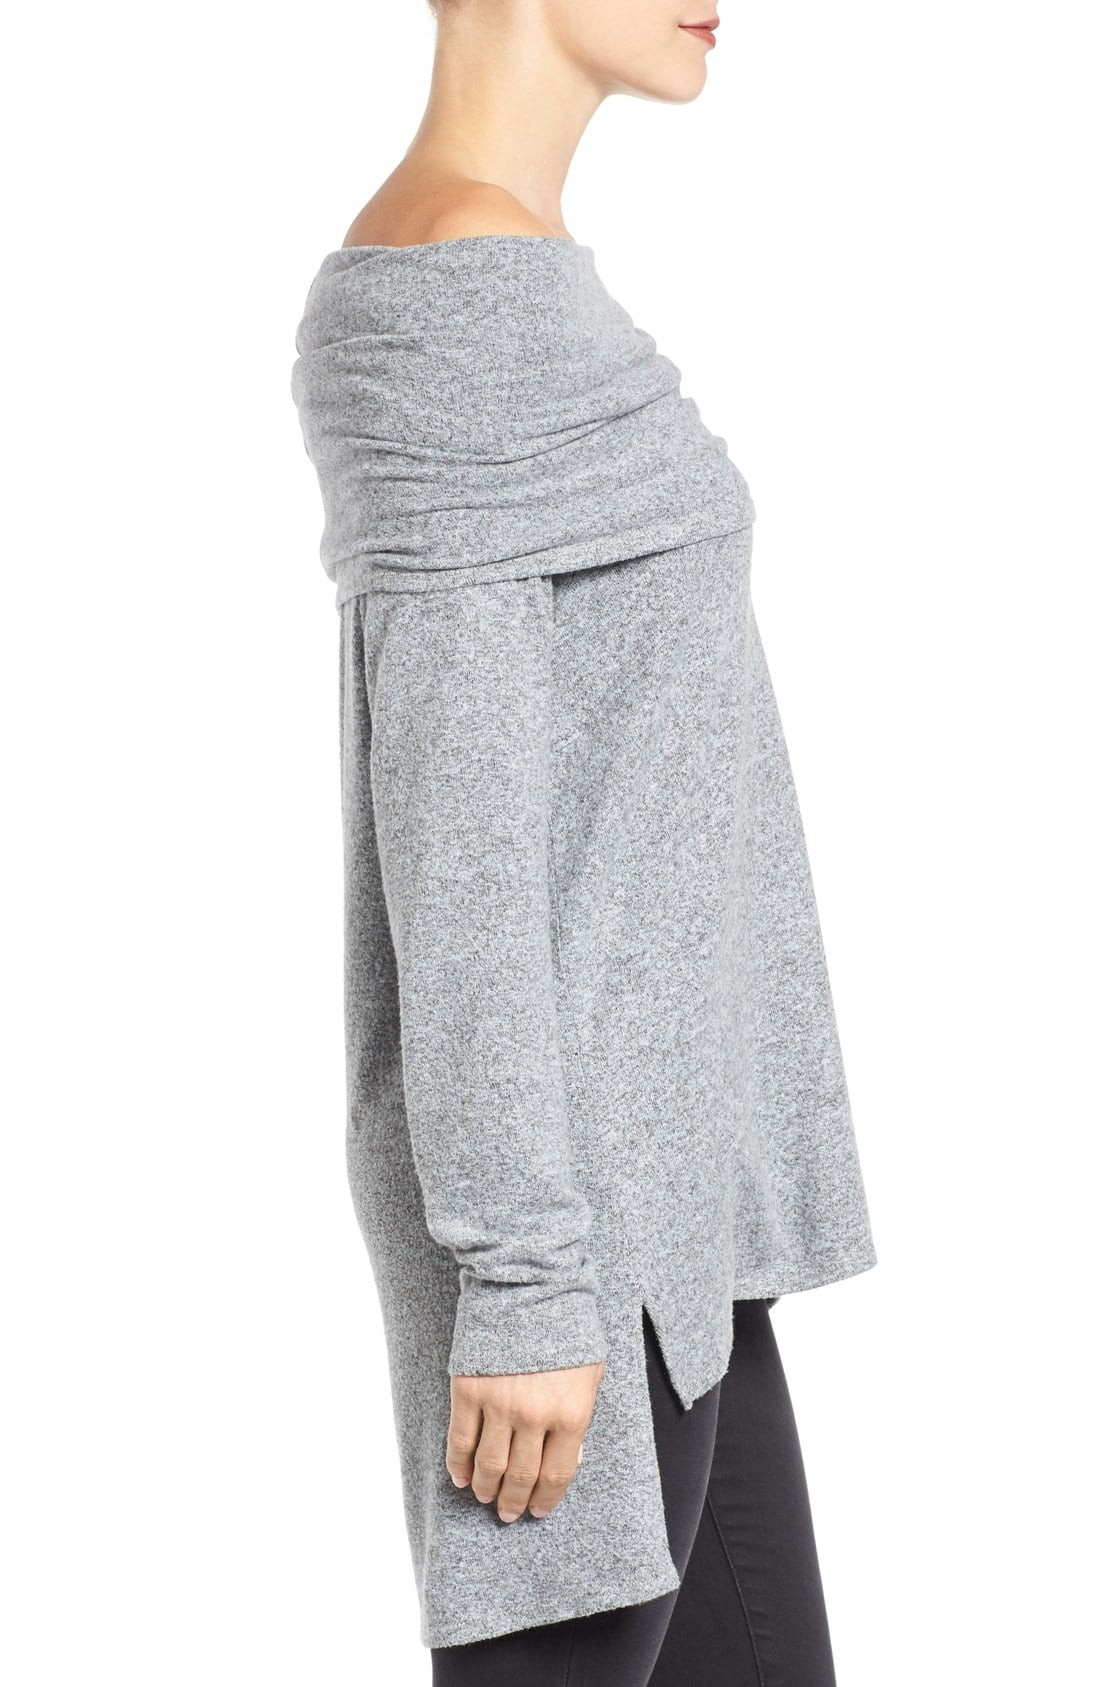 Sweater Weather — Hey Nasreen